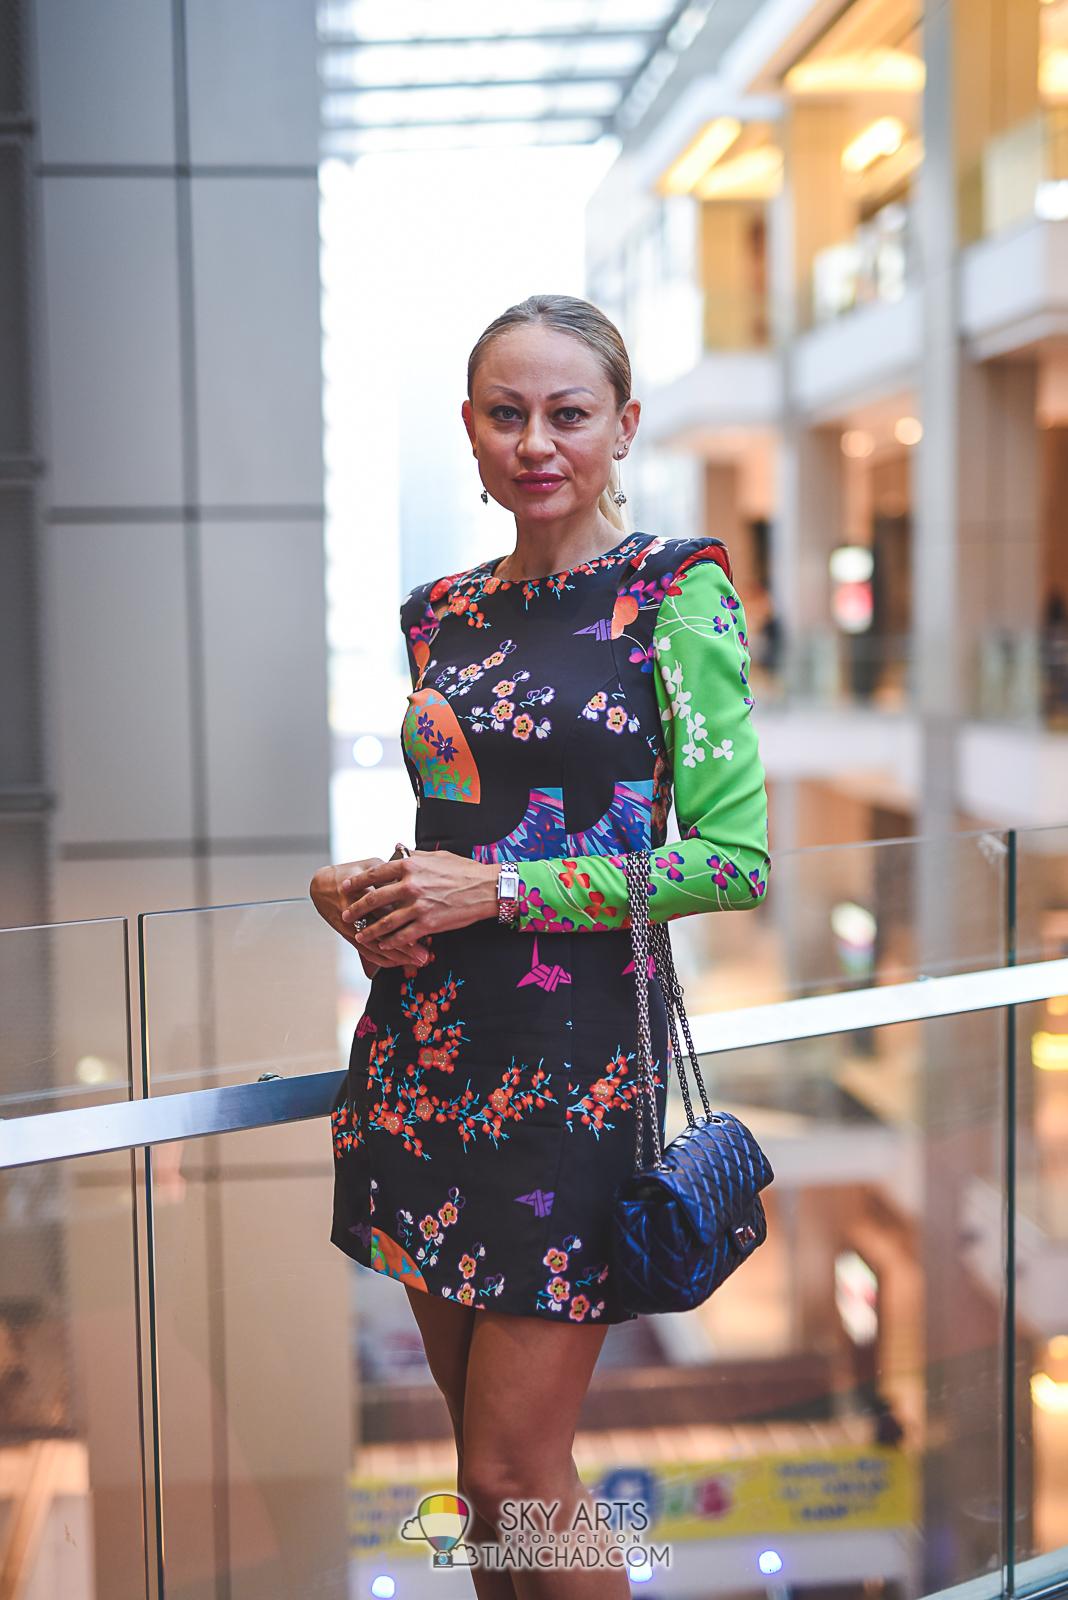 MUUK - Fashion/Mode - Cindy - Taille 36 - Marron hIMcT